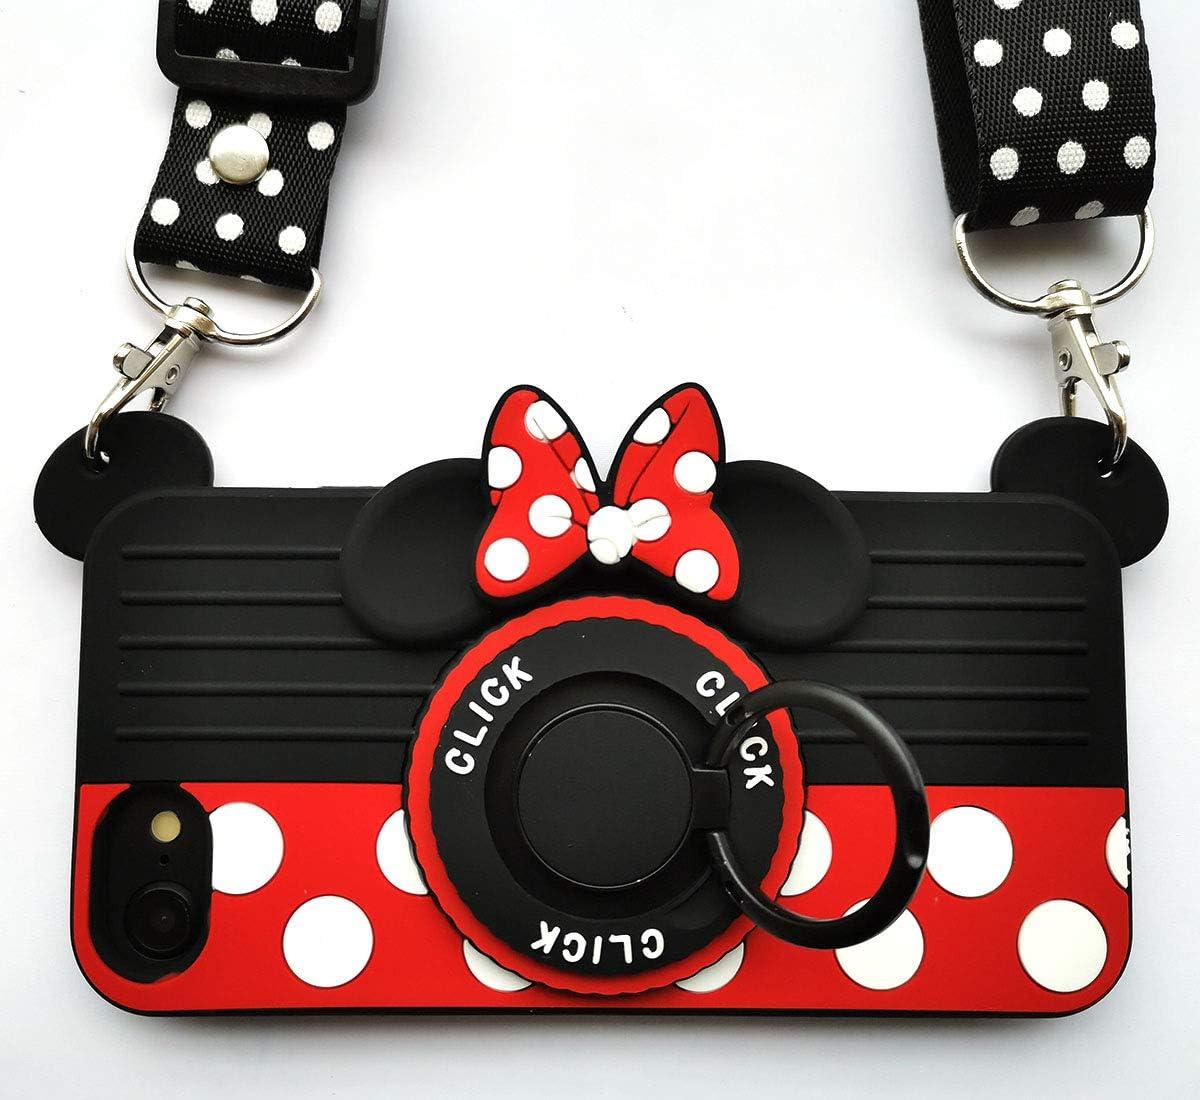 iPhone SE Case(2020) iPhone 8 Case iPhone 7 Case iPhone 6 Case 6S Case 3D Cute Soft Silicone Cartoon Minnie Mouse Camera Design Phone Case Women/Girl/Friends Classmate Best Birthday Gift (4.7in)